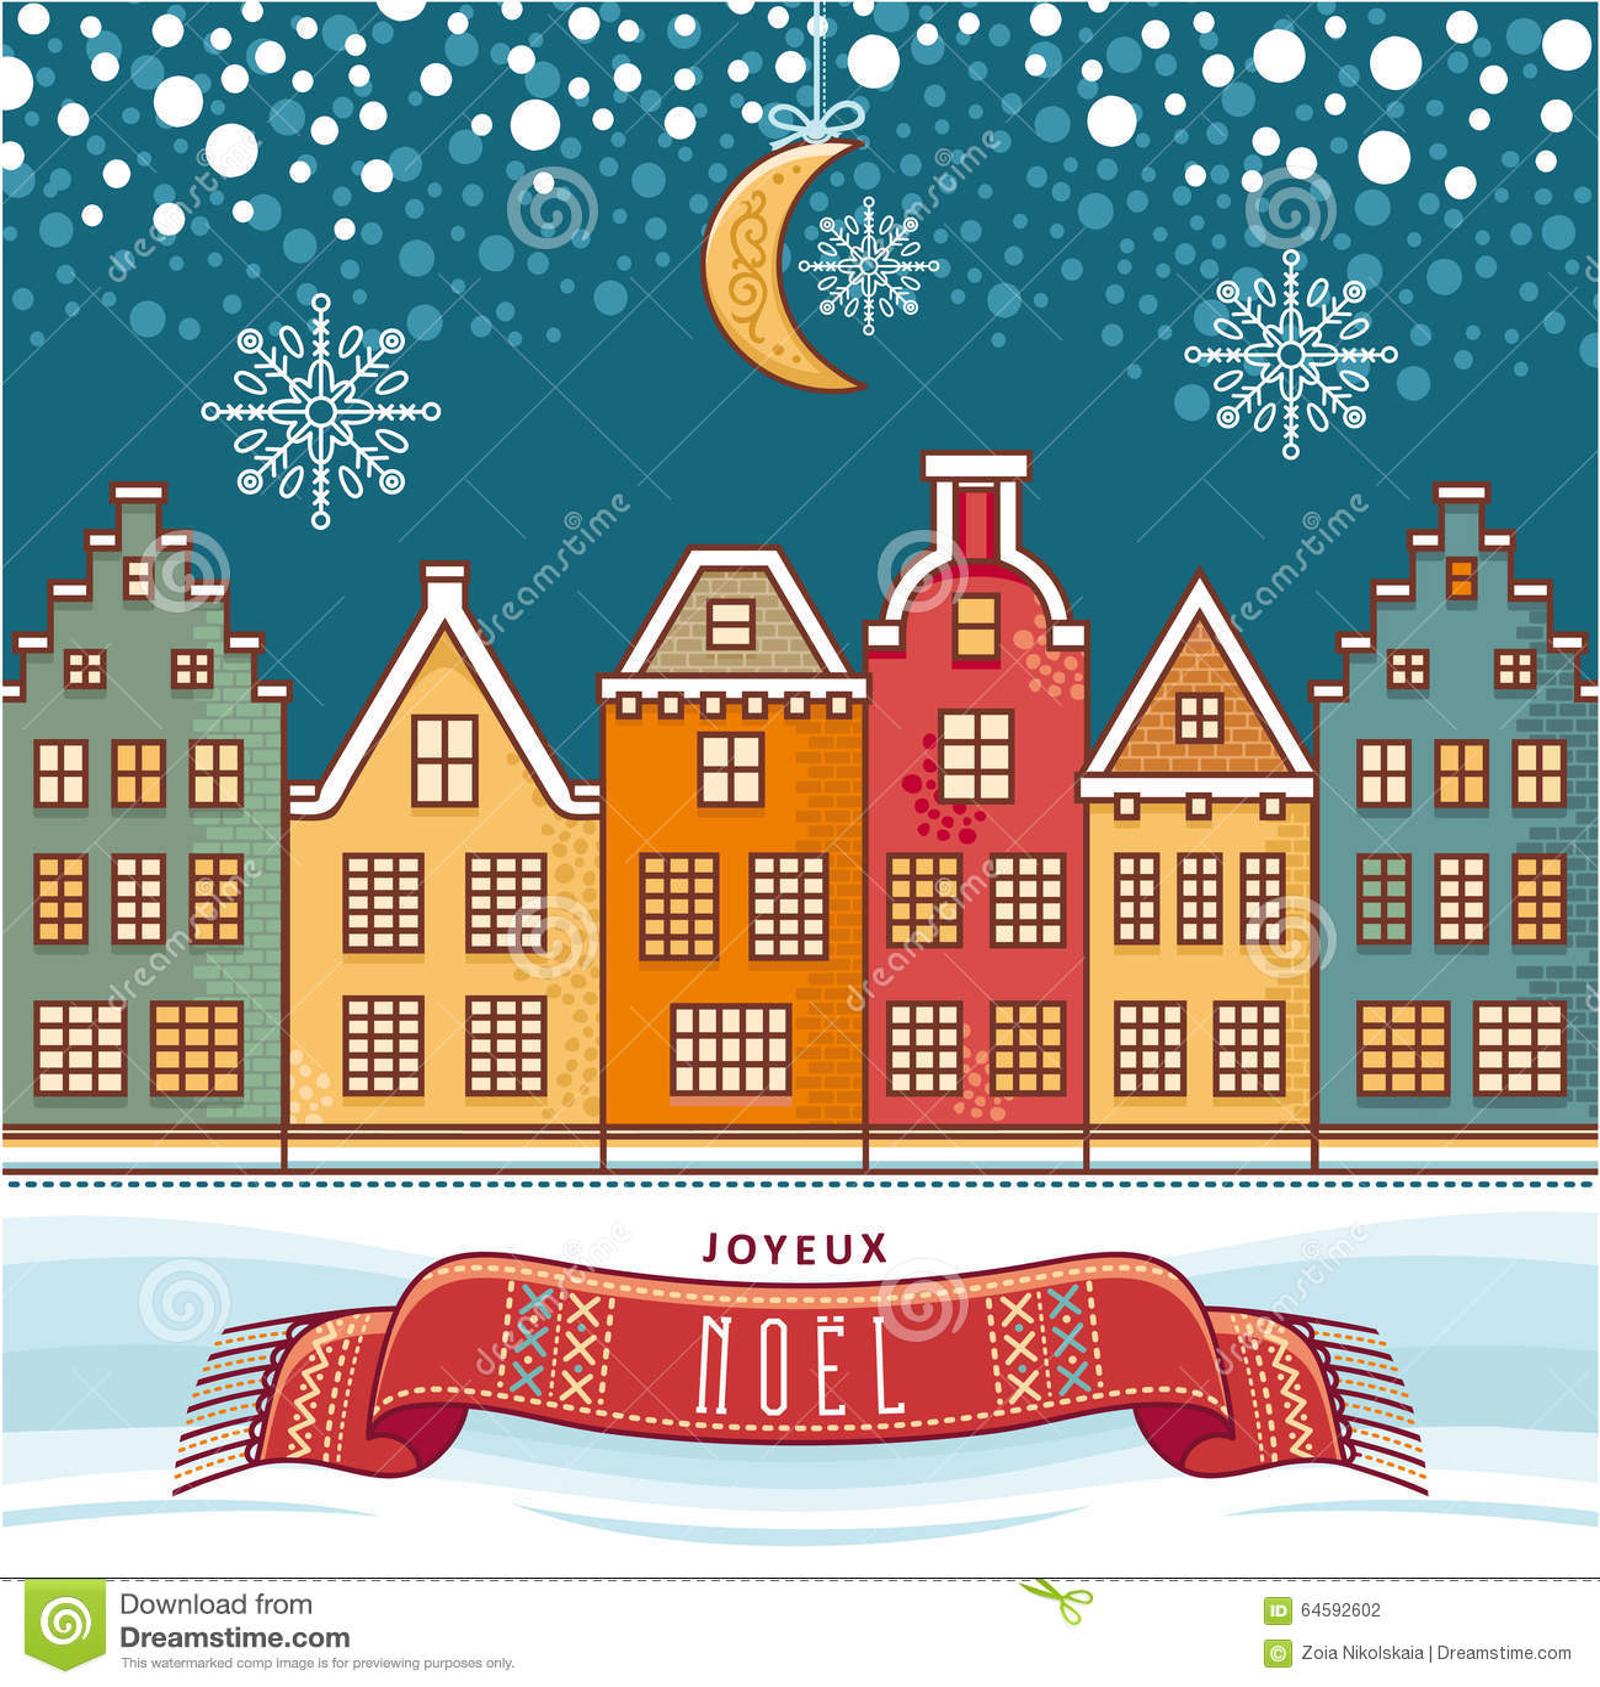 Joyeux noel merry christmas in french stock vector illustration merry christmas in french kristyandbryce Choice Image